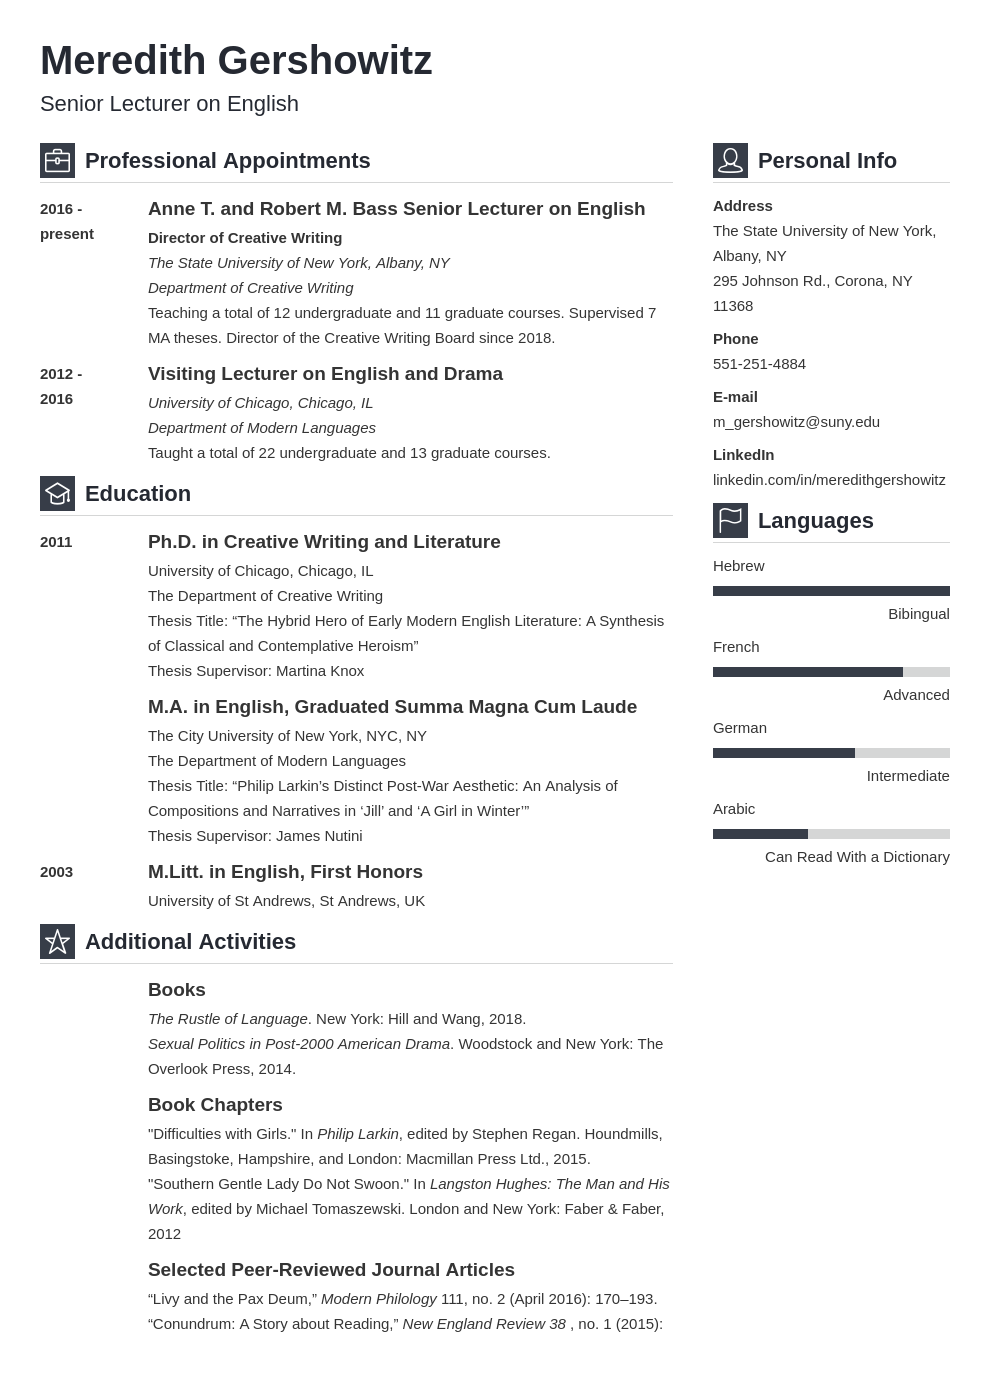 cv academic template vibes uk